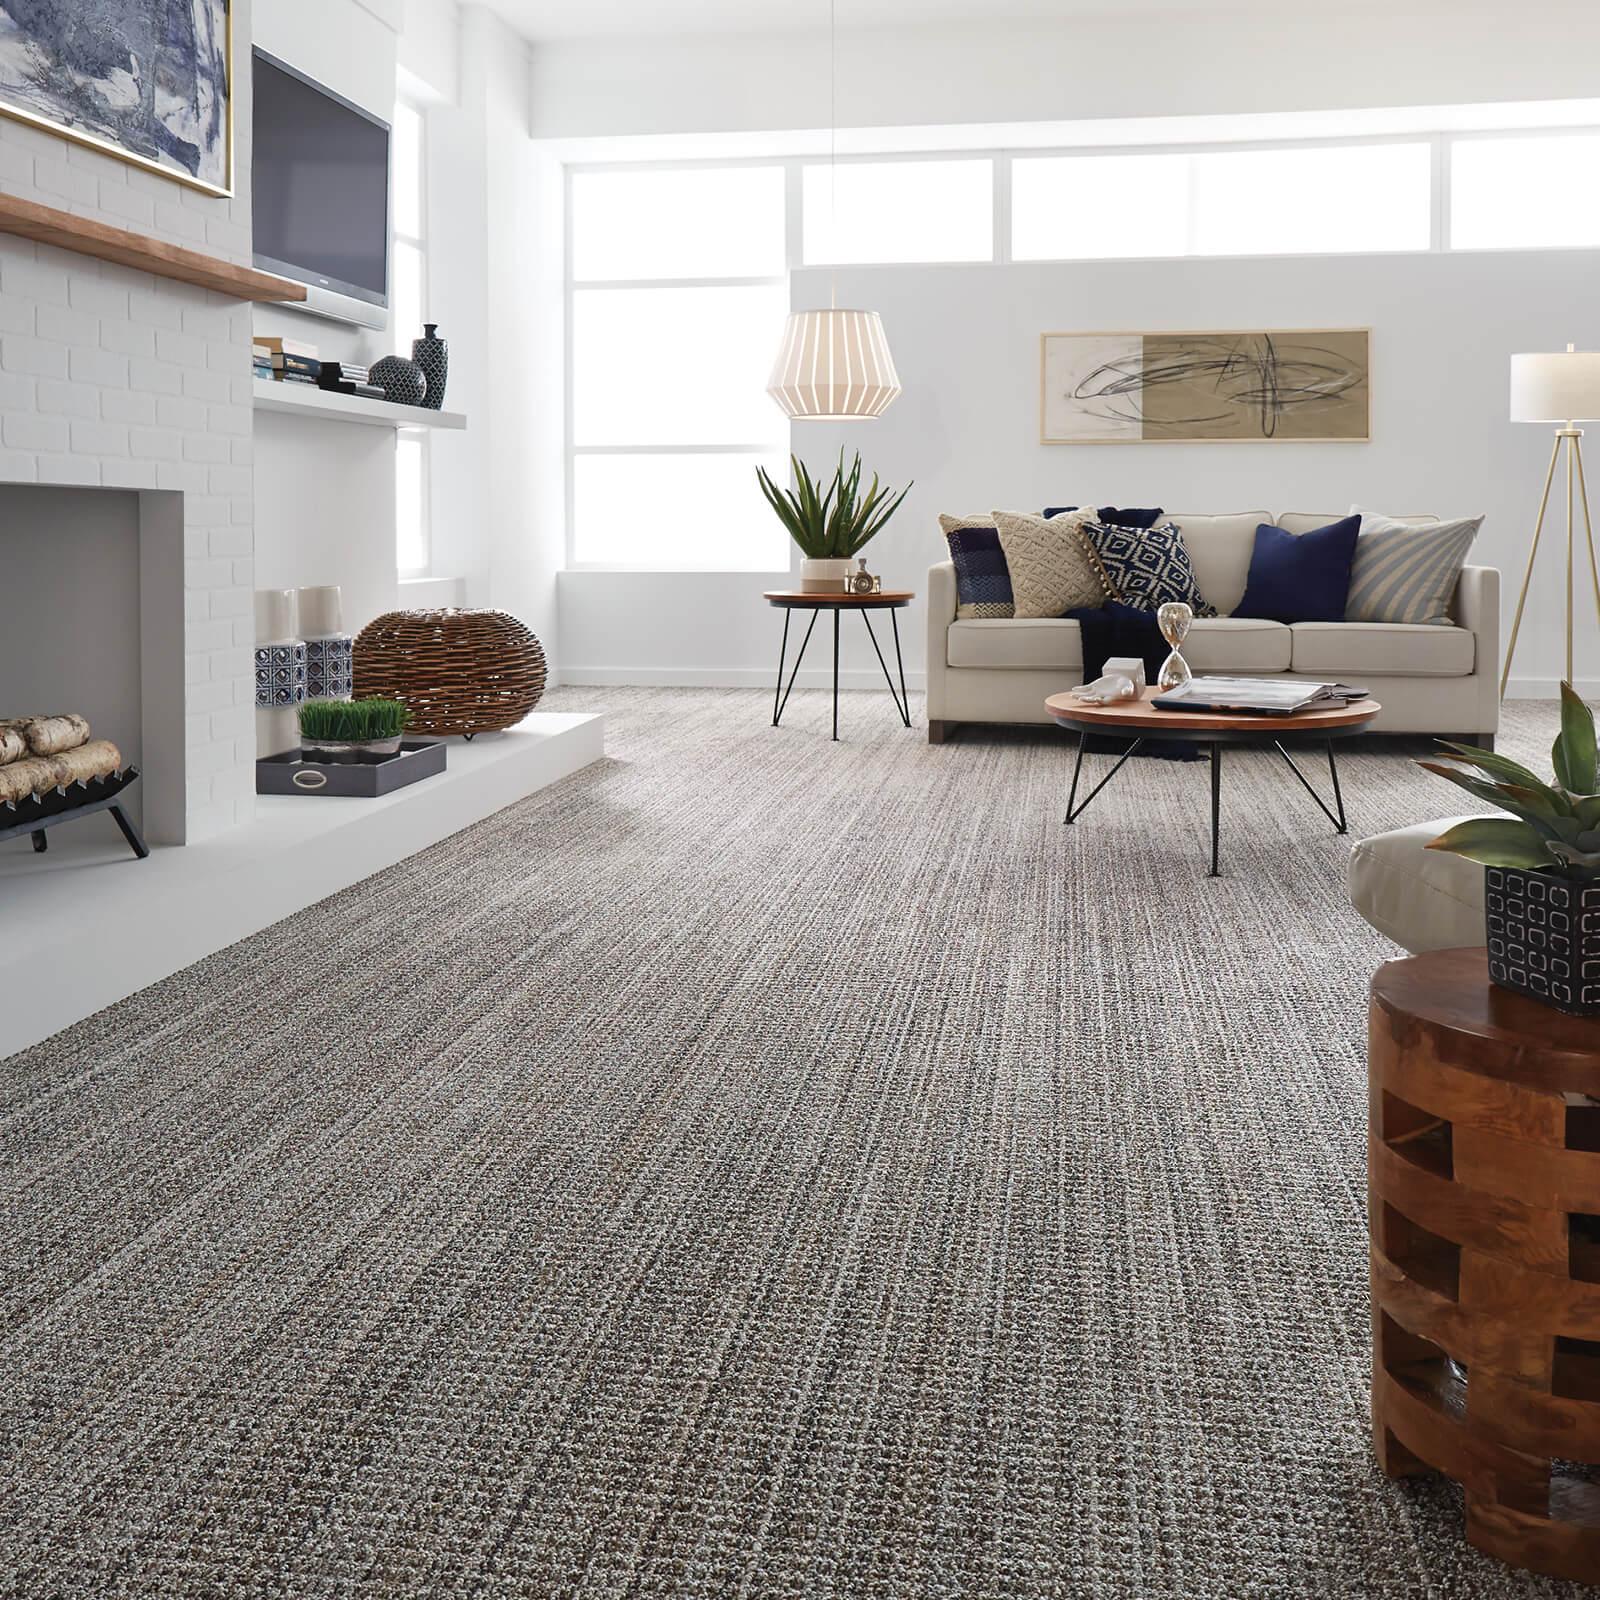 Spacious living room with Carpet flooring | Kirkland's Flooring